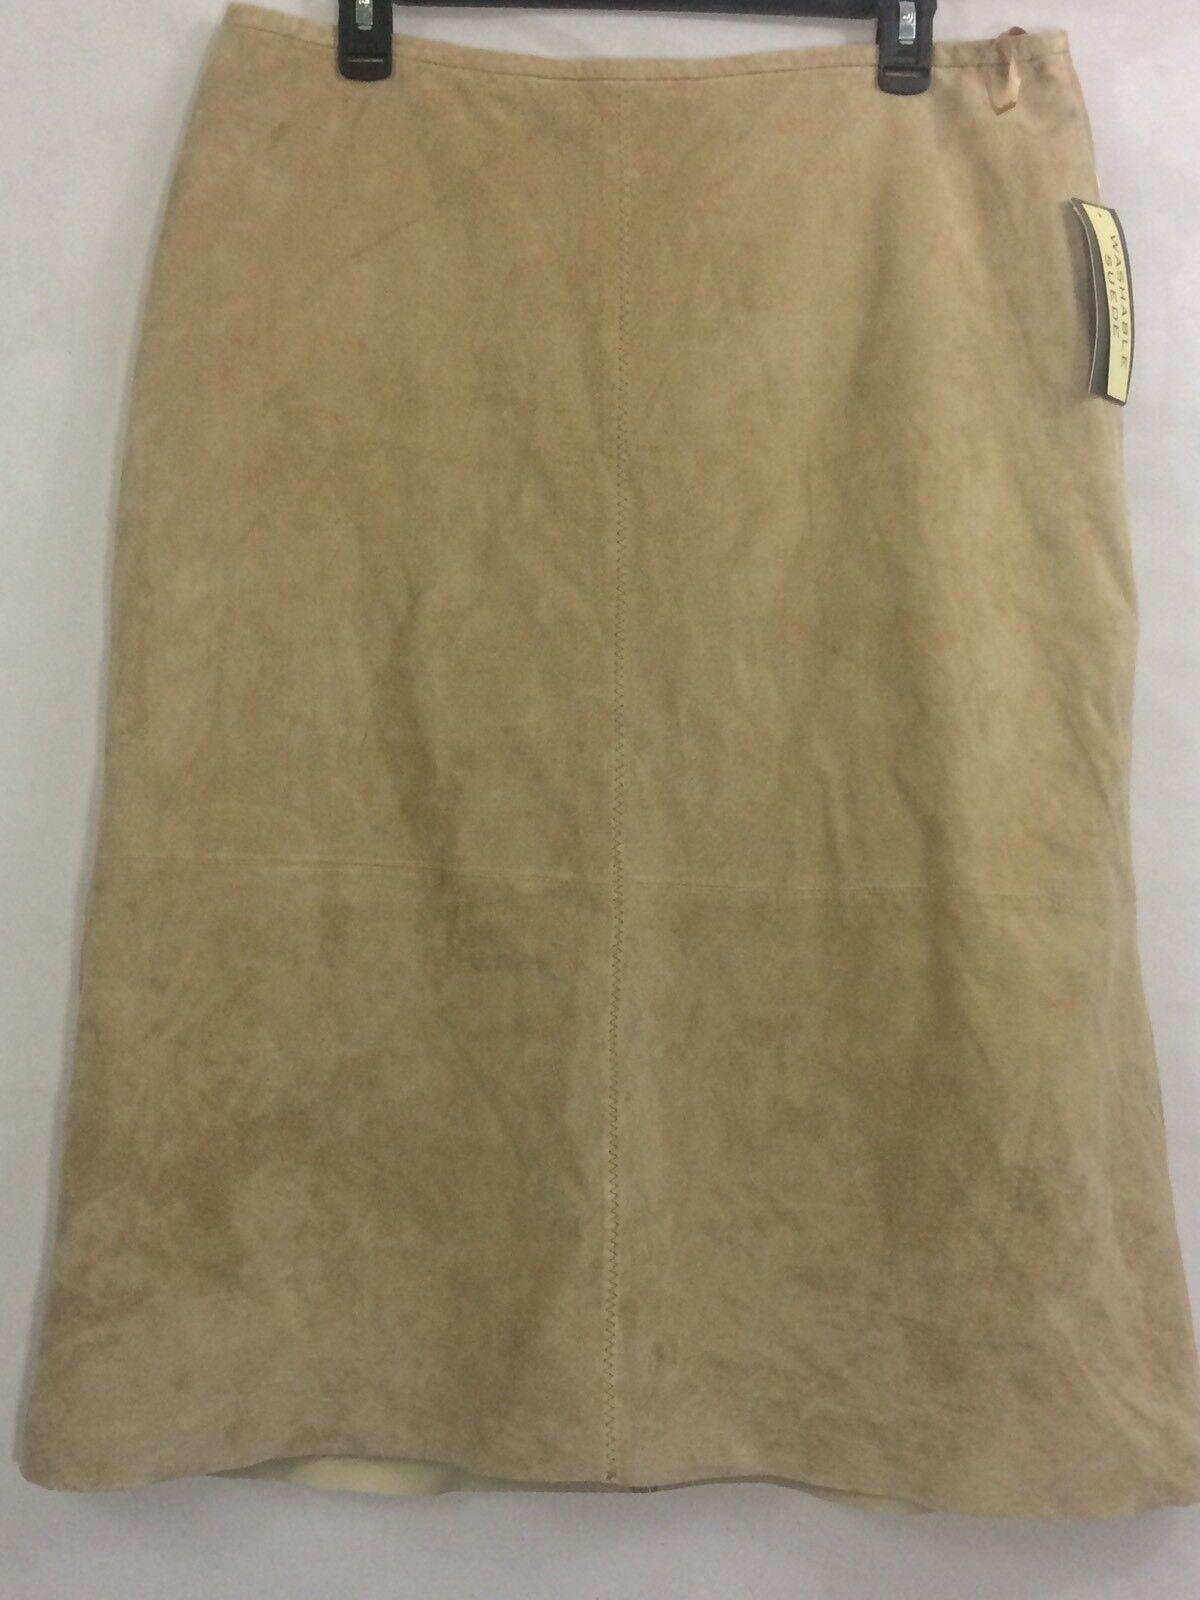 NWT Womens John Paul Richard Leather Pencil Skirt Size 16 Tan Washable Suede